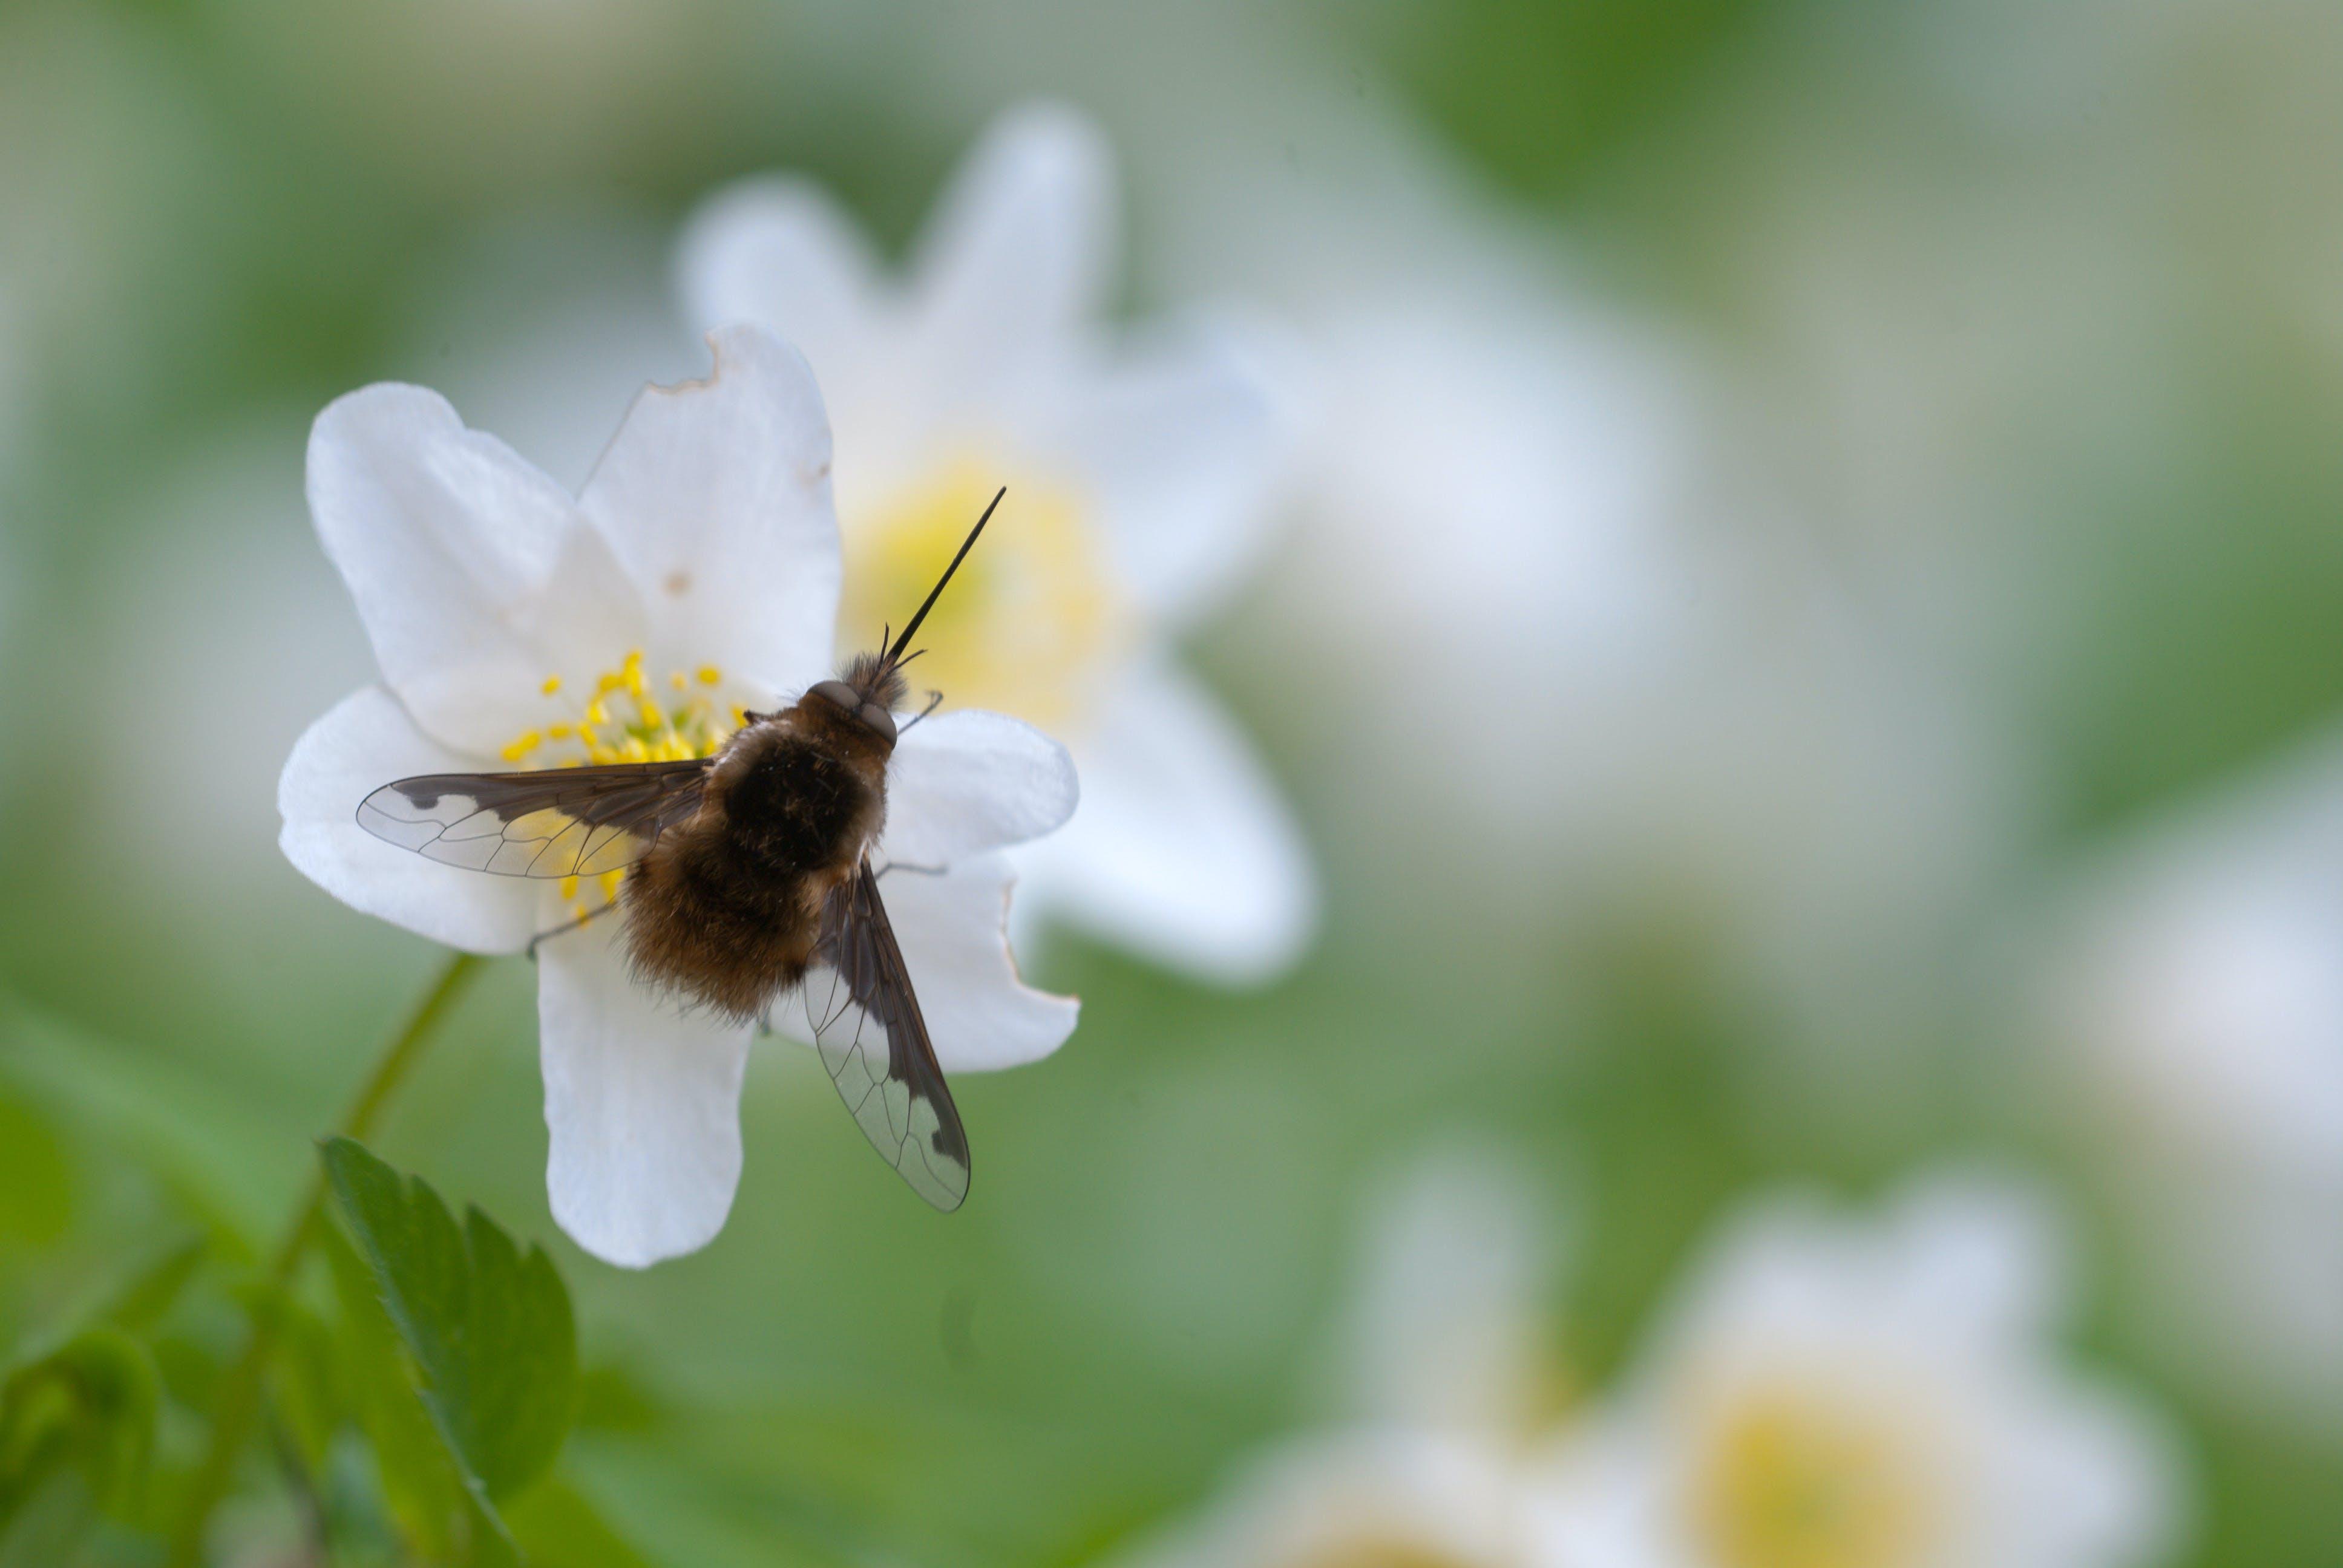 Brown Moth on White Petal Flower during Daytime